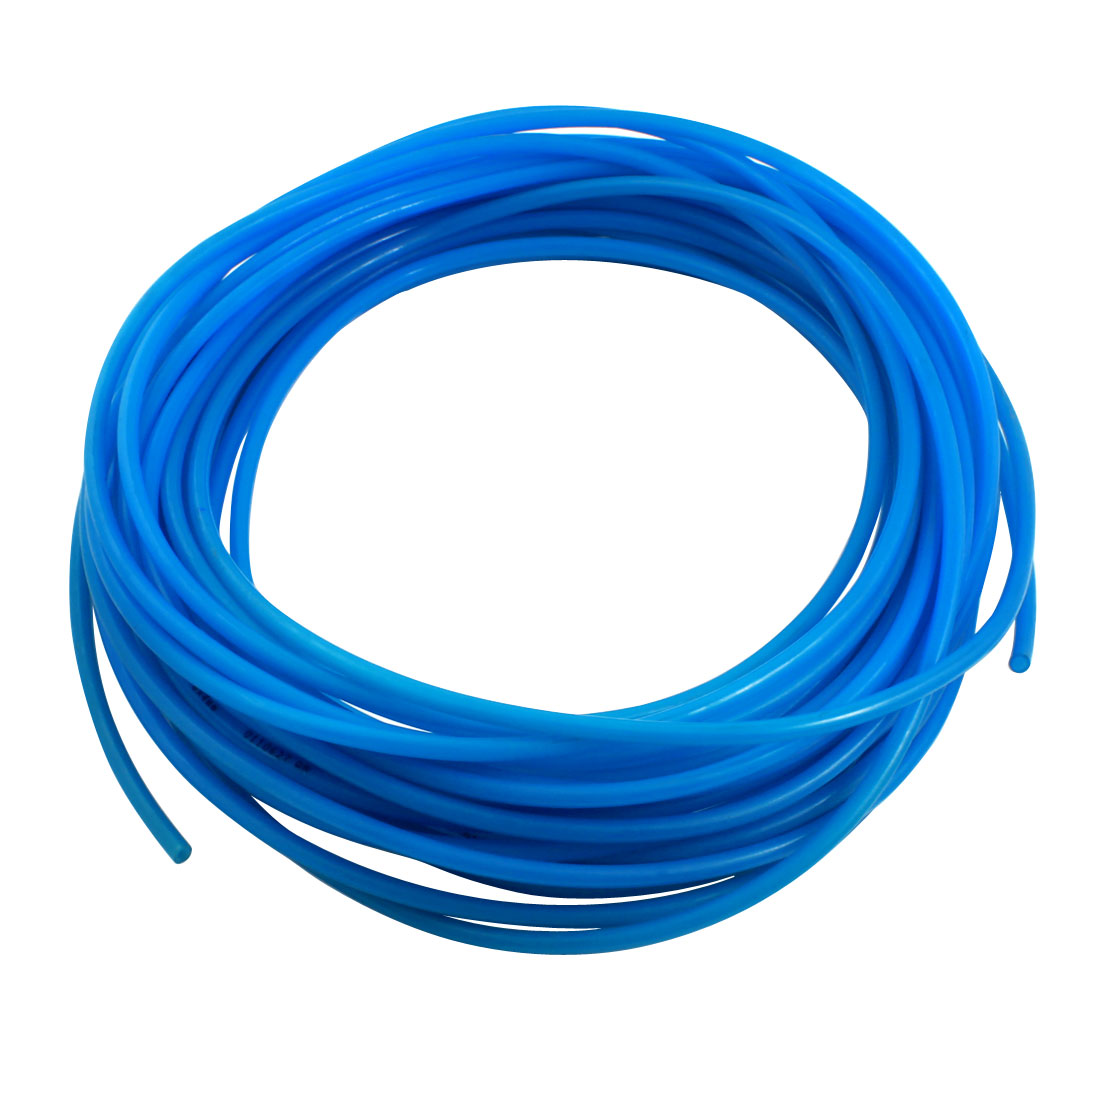 20M/66Ft 4x6mm Blue Polyurethane Fuel Gas Petrol Diesel Flexible Air PU Tube Pneumatic Pipe Hose